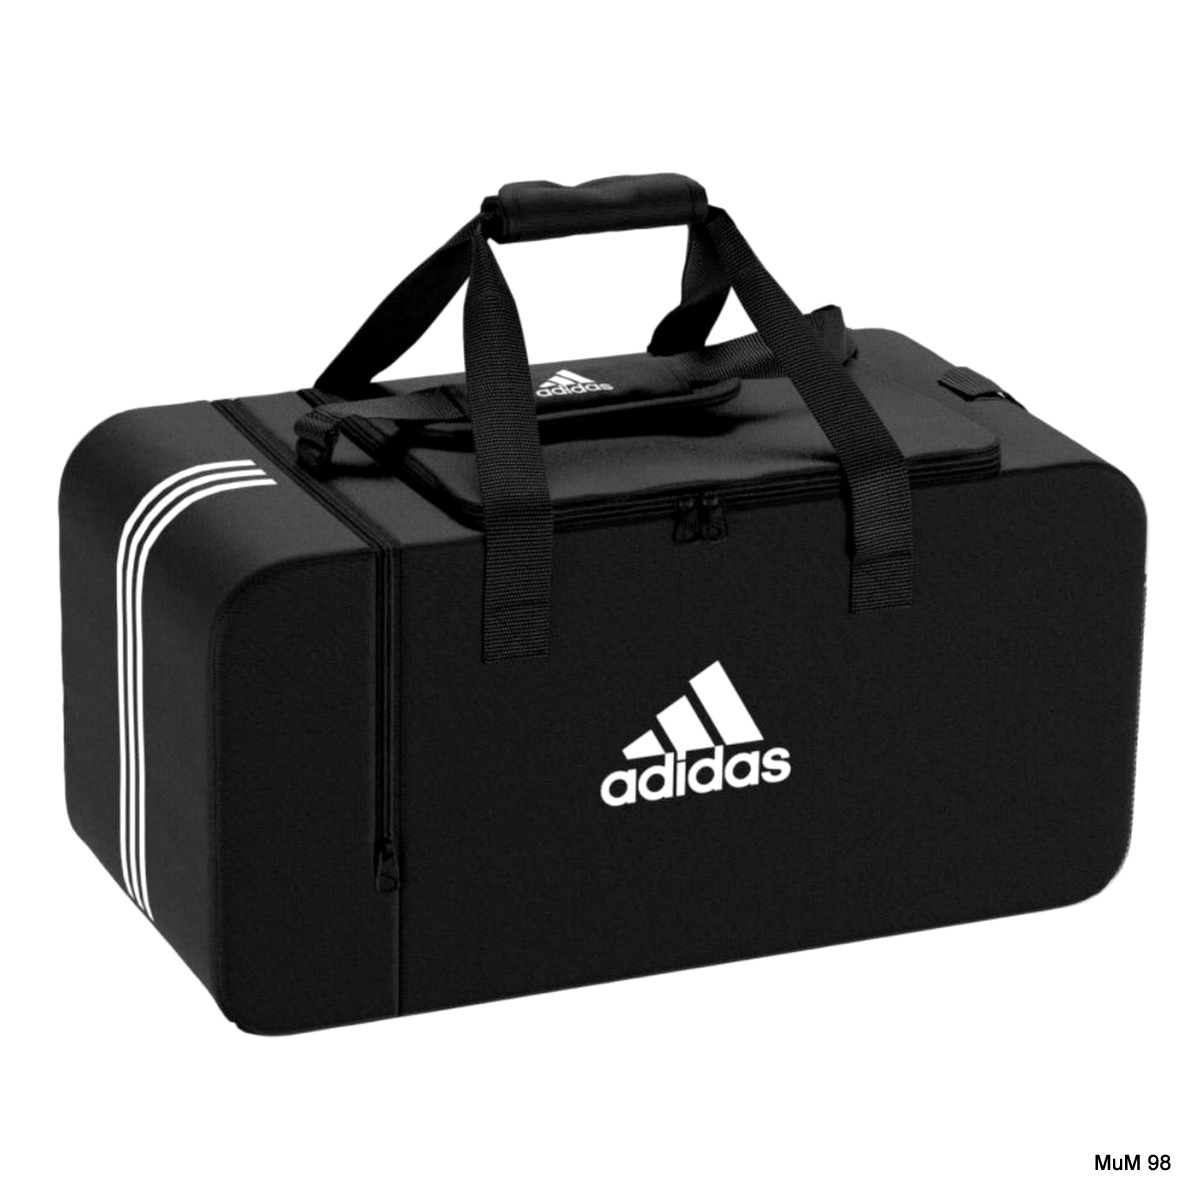 Adidas Tiro DU M